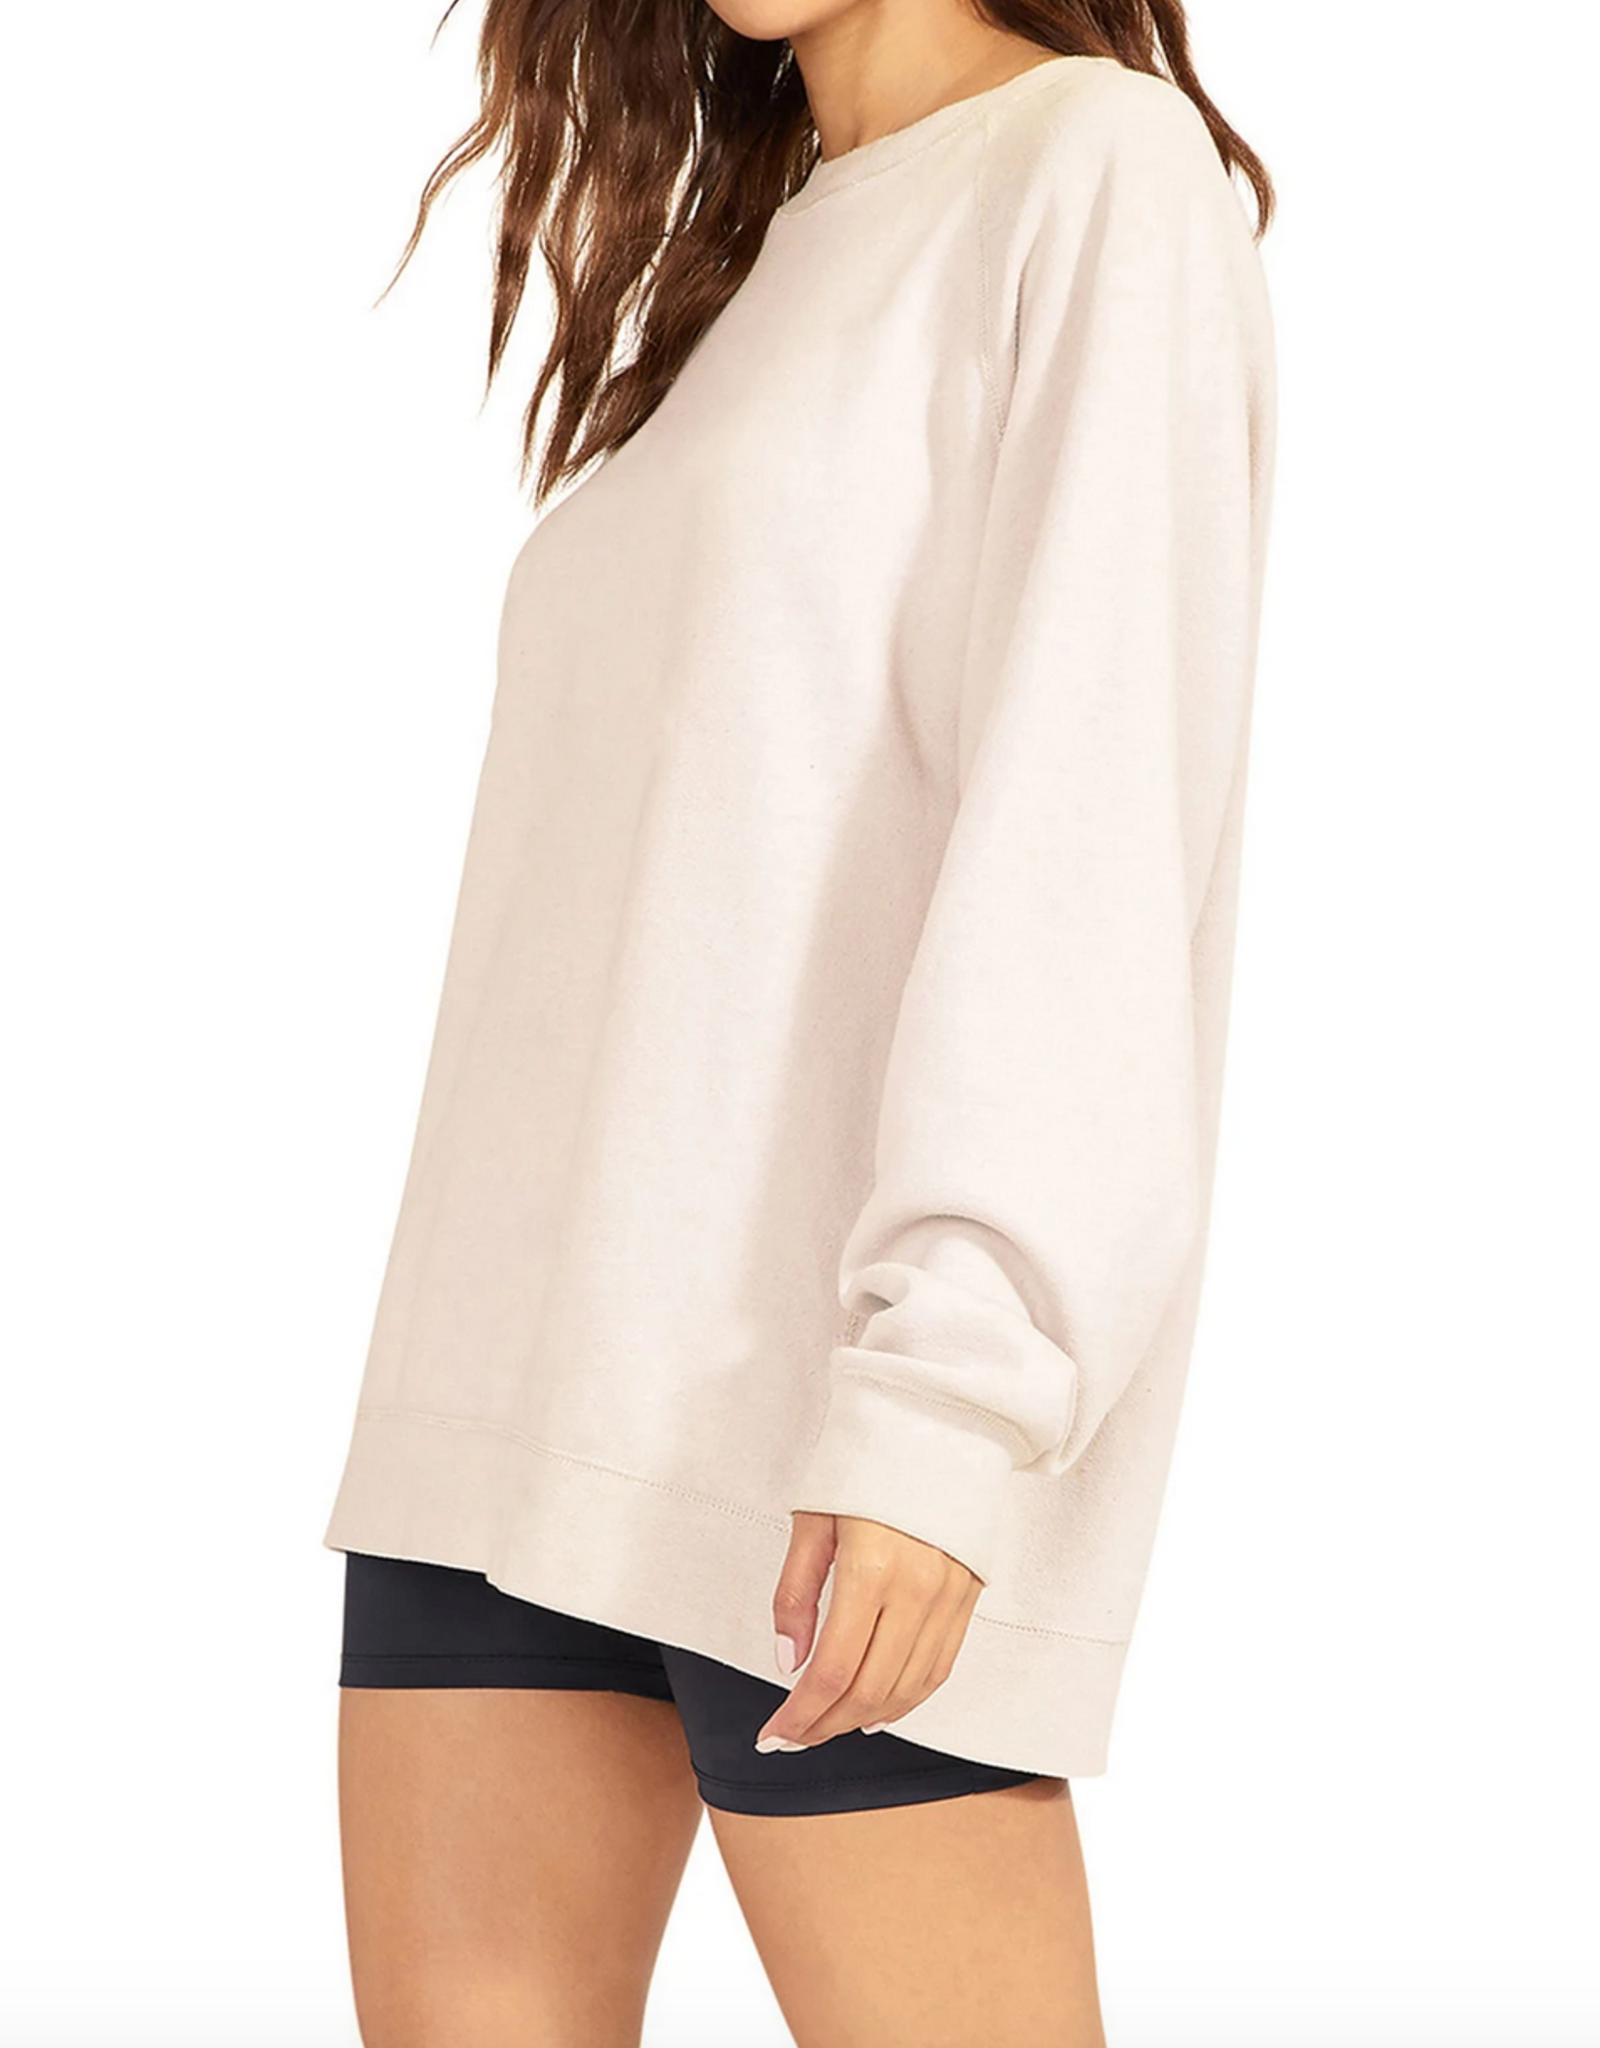 Bb Dakota Send Moods Sweatshirt